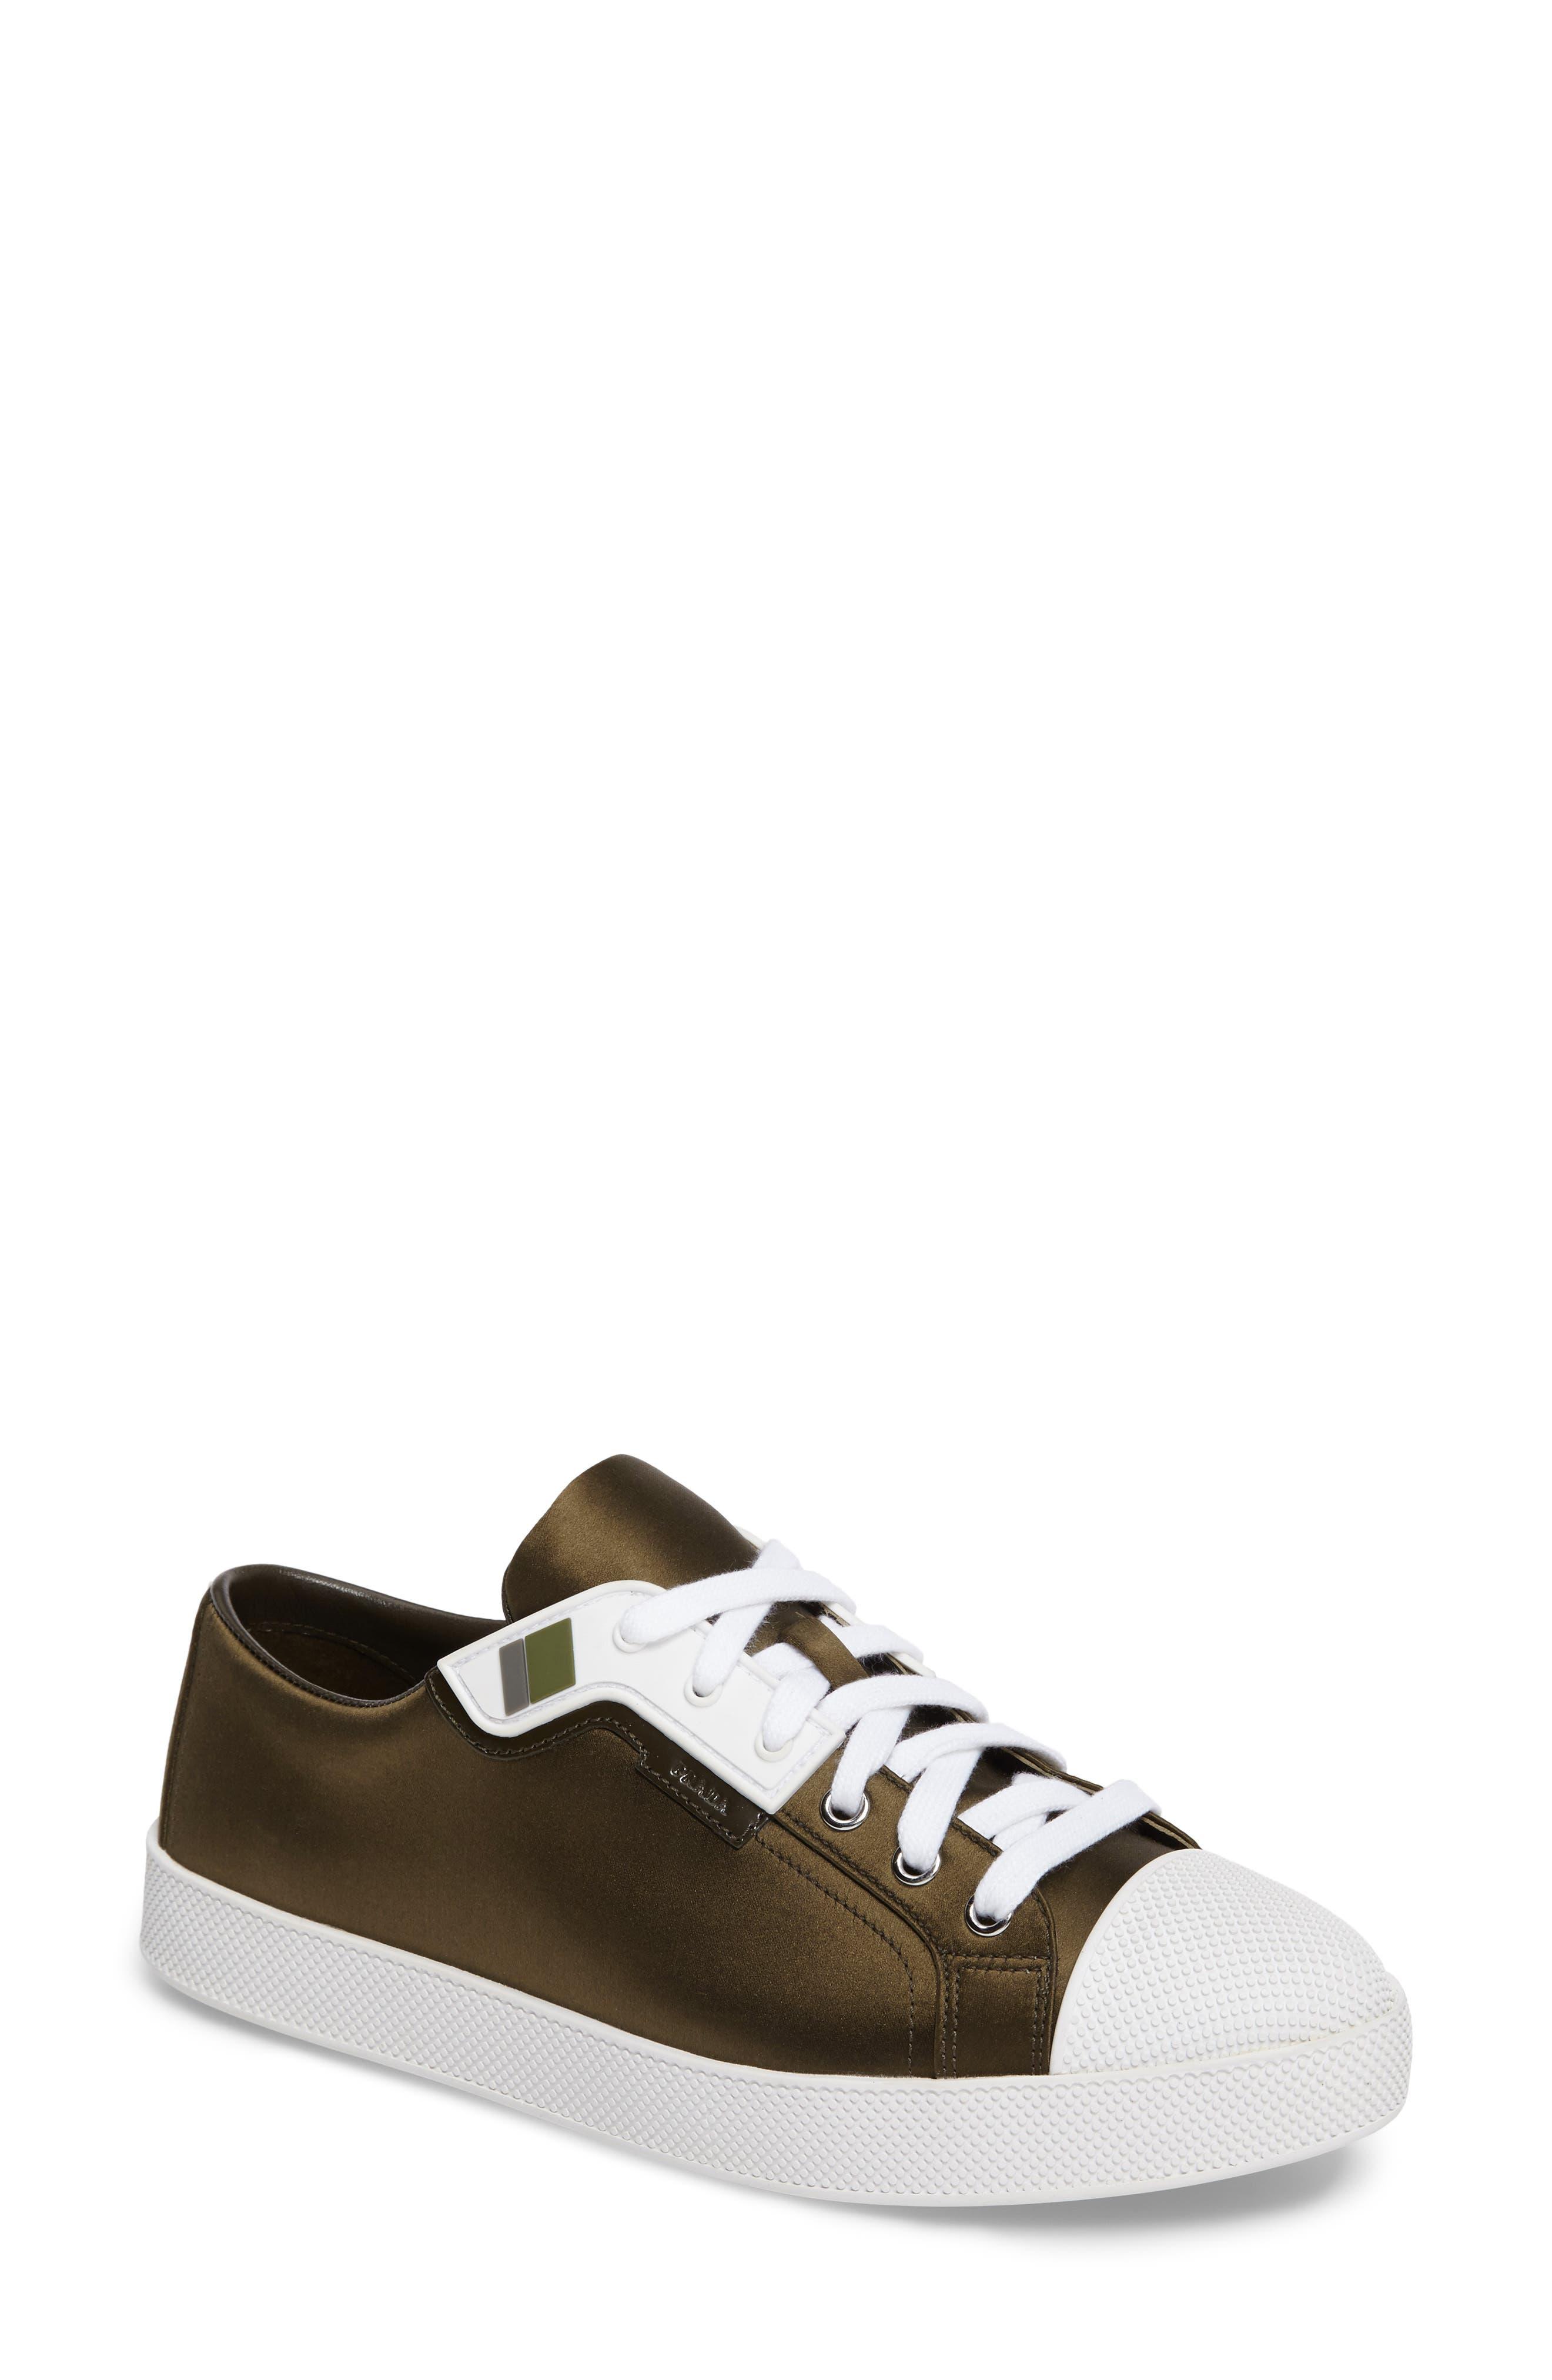 Prada Linea Rossa Platform Sneaker (Women)